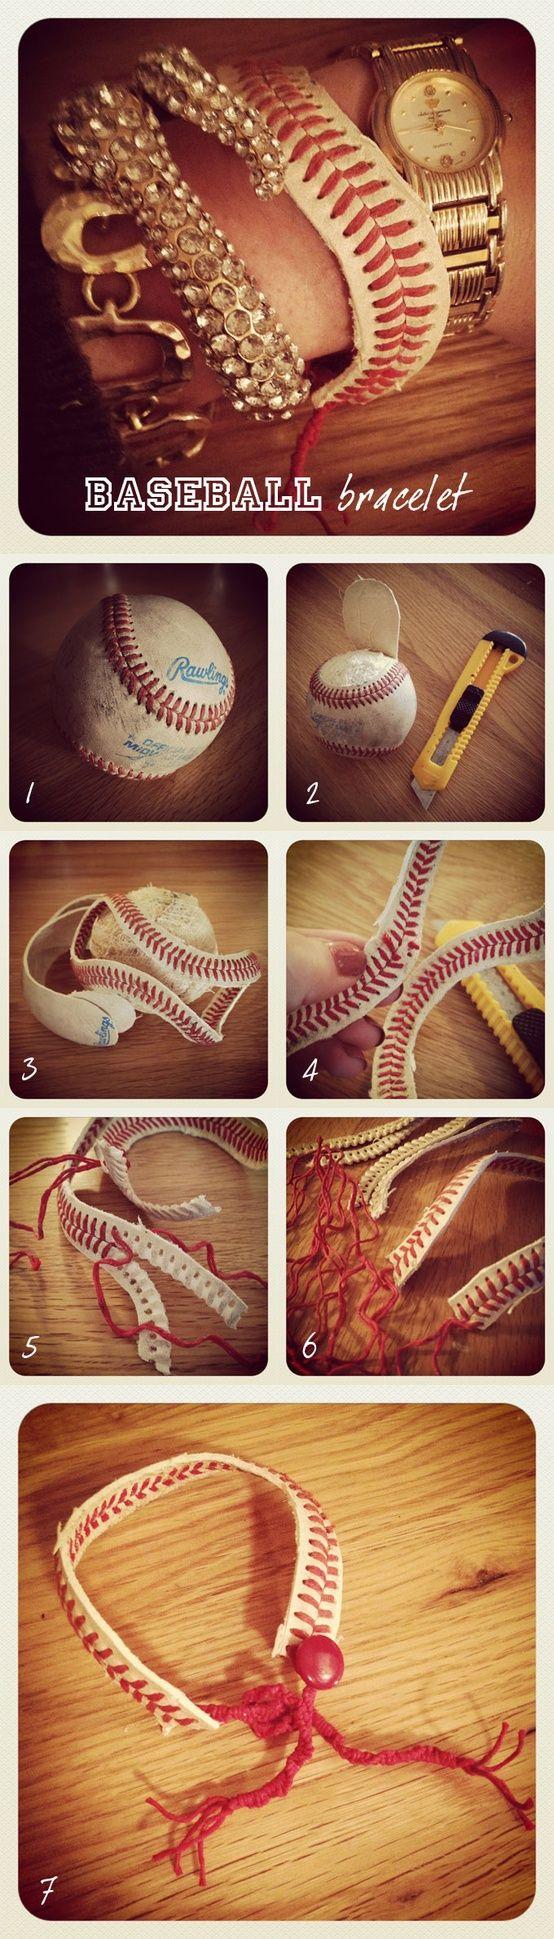 Baseball Bracelet - Click image to find more Women's Fashion Pinterest pins